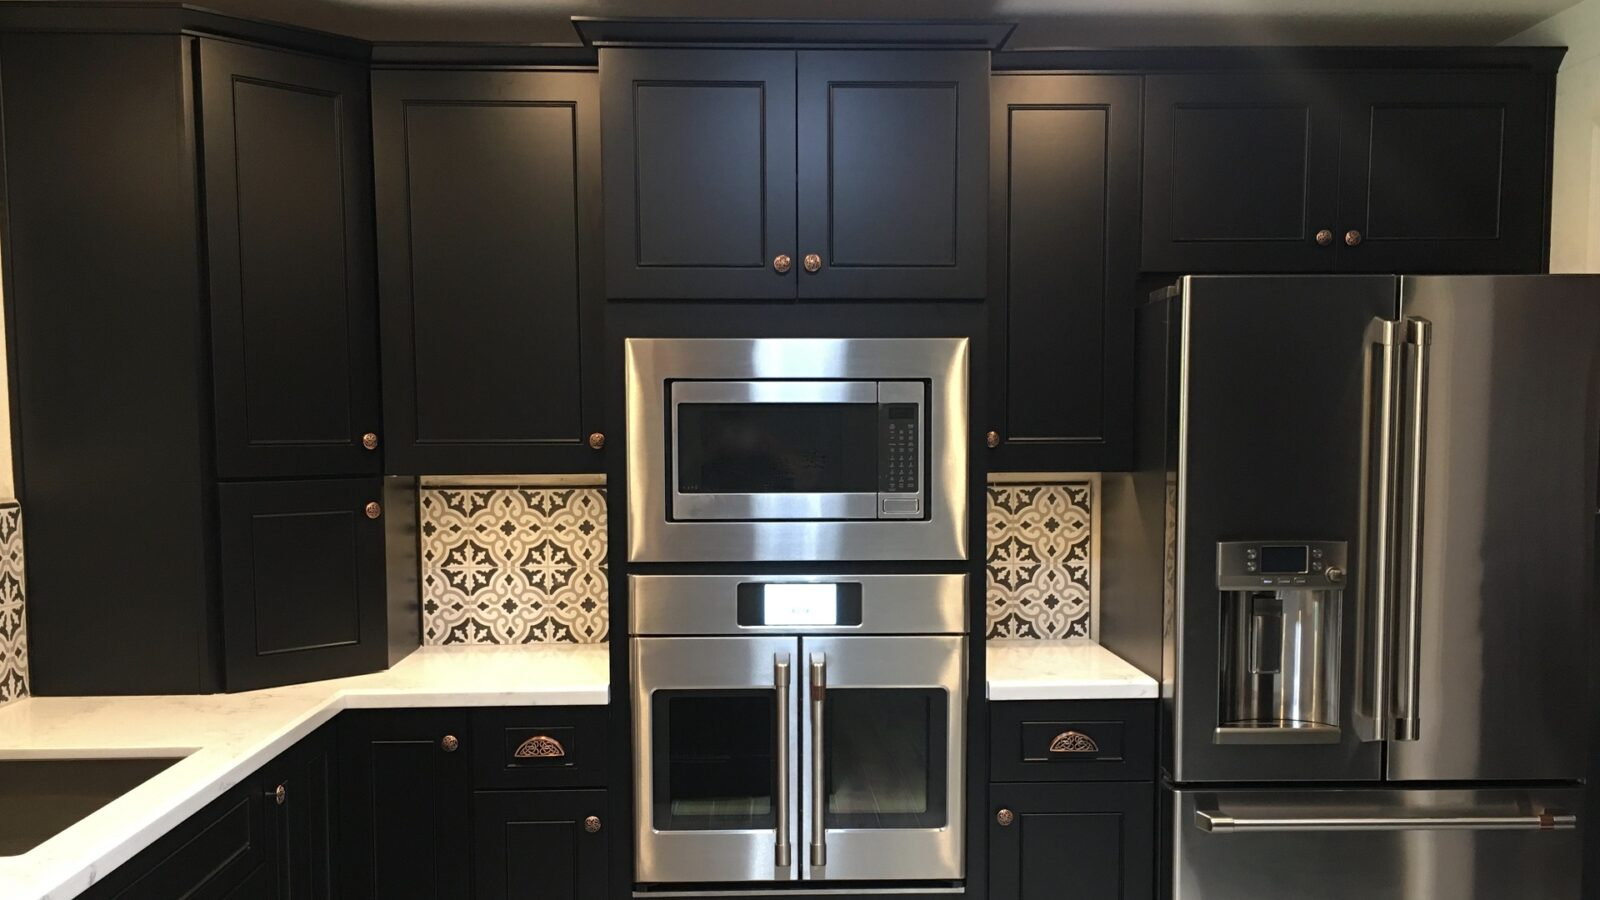 Black kitchen panels with silver kitchen electronics